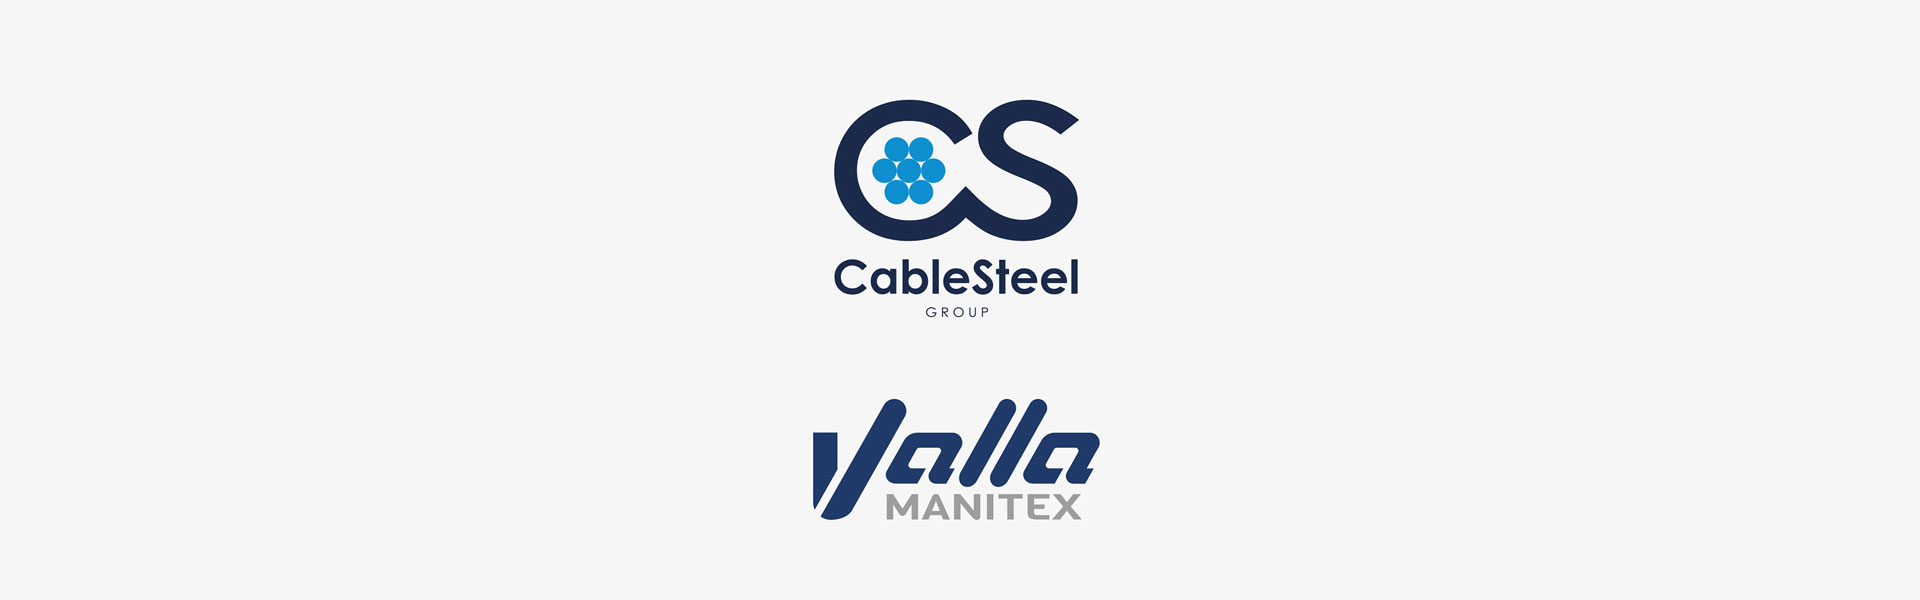 Cablesteel partner di Manitex Valla